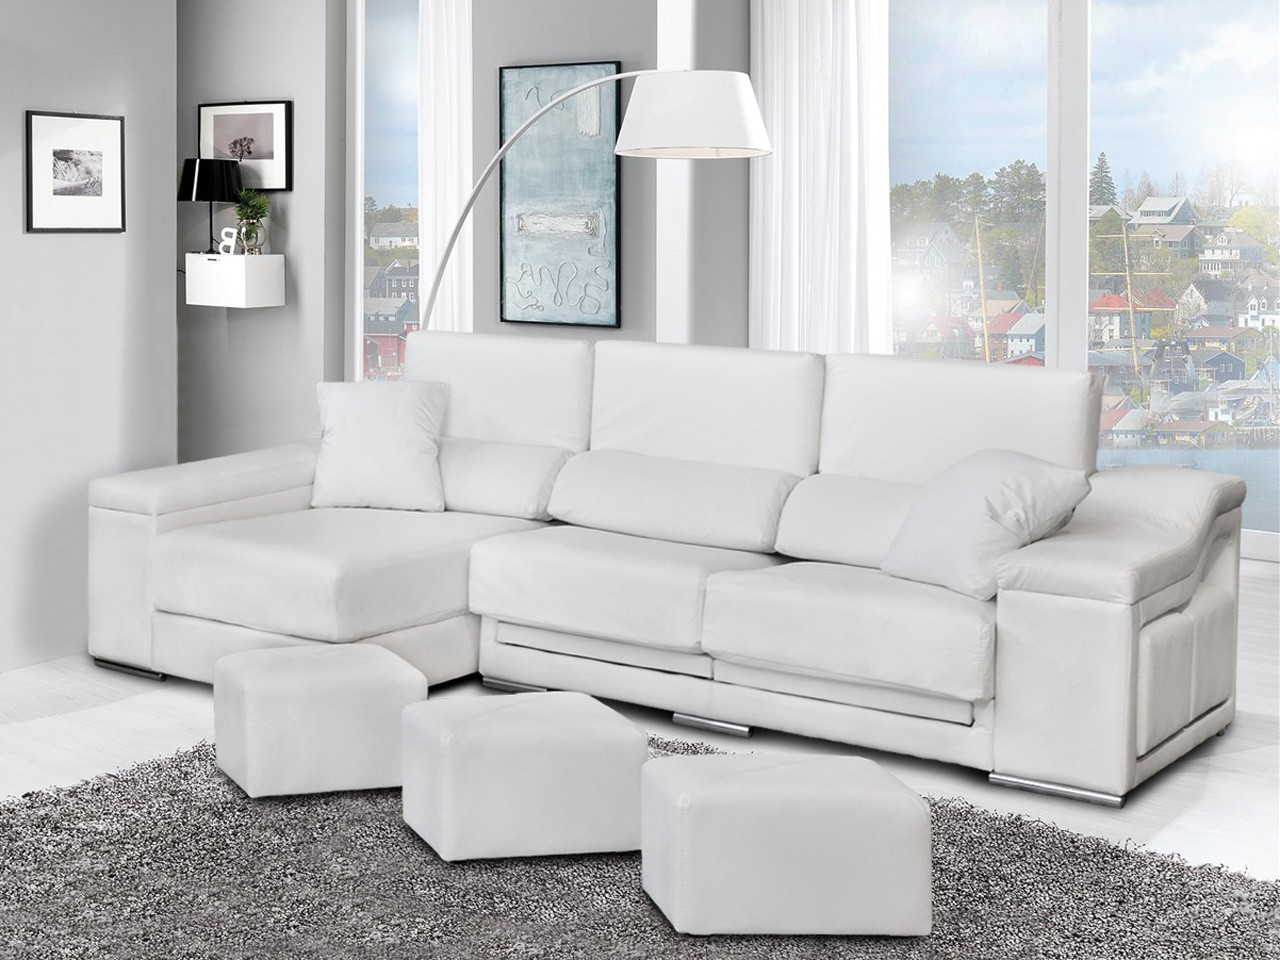 Dicoro sofas Zwd9 sofà Chaise Longue Con Puffs Jaguar